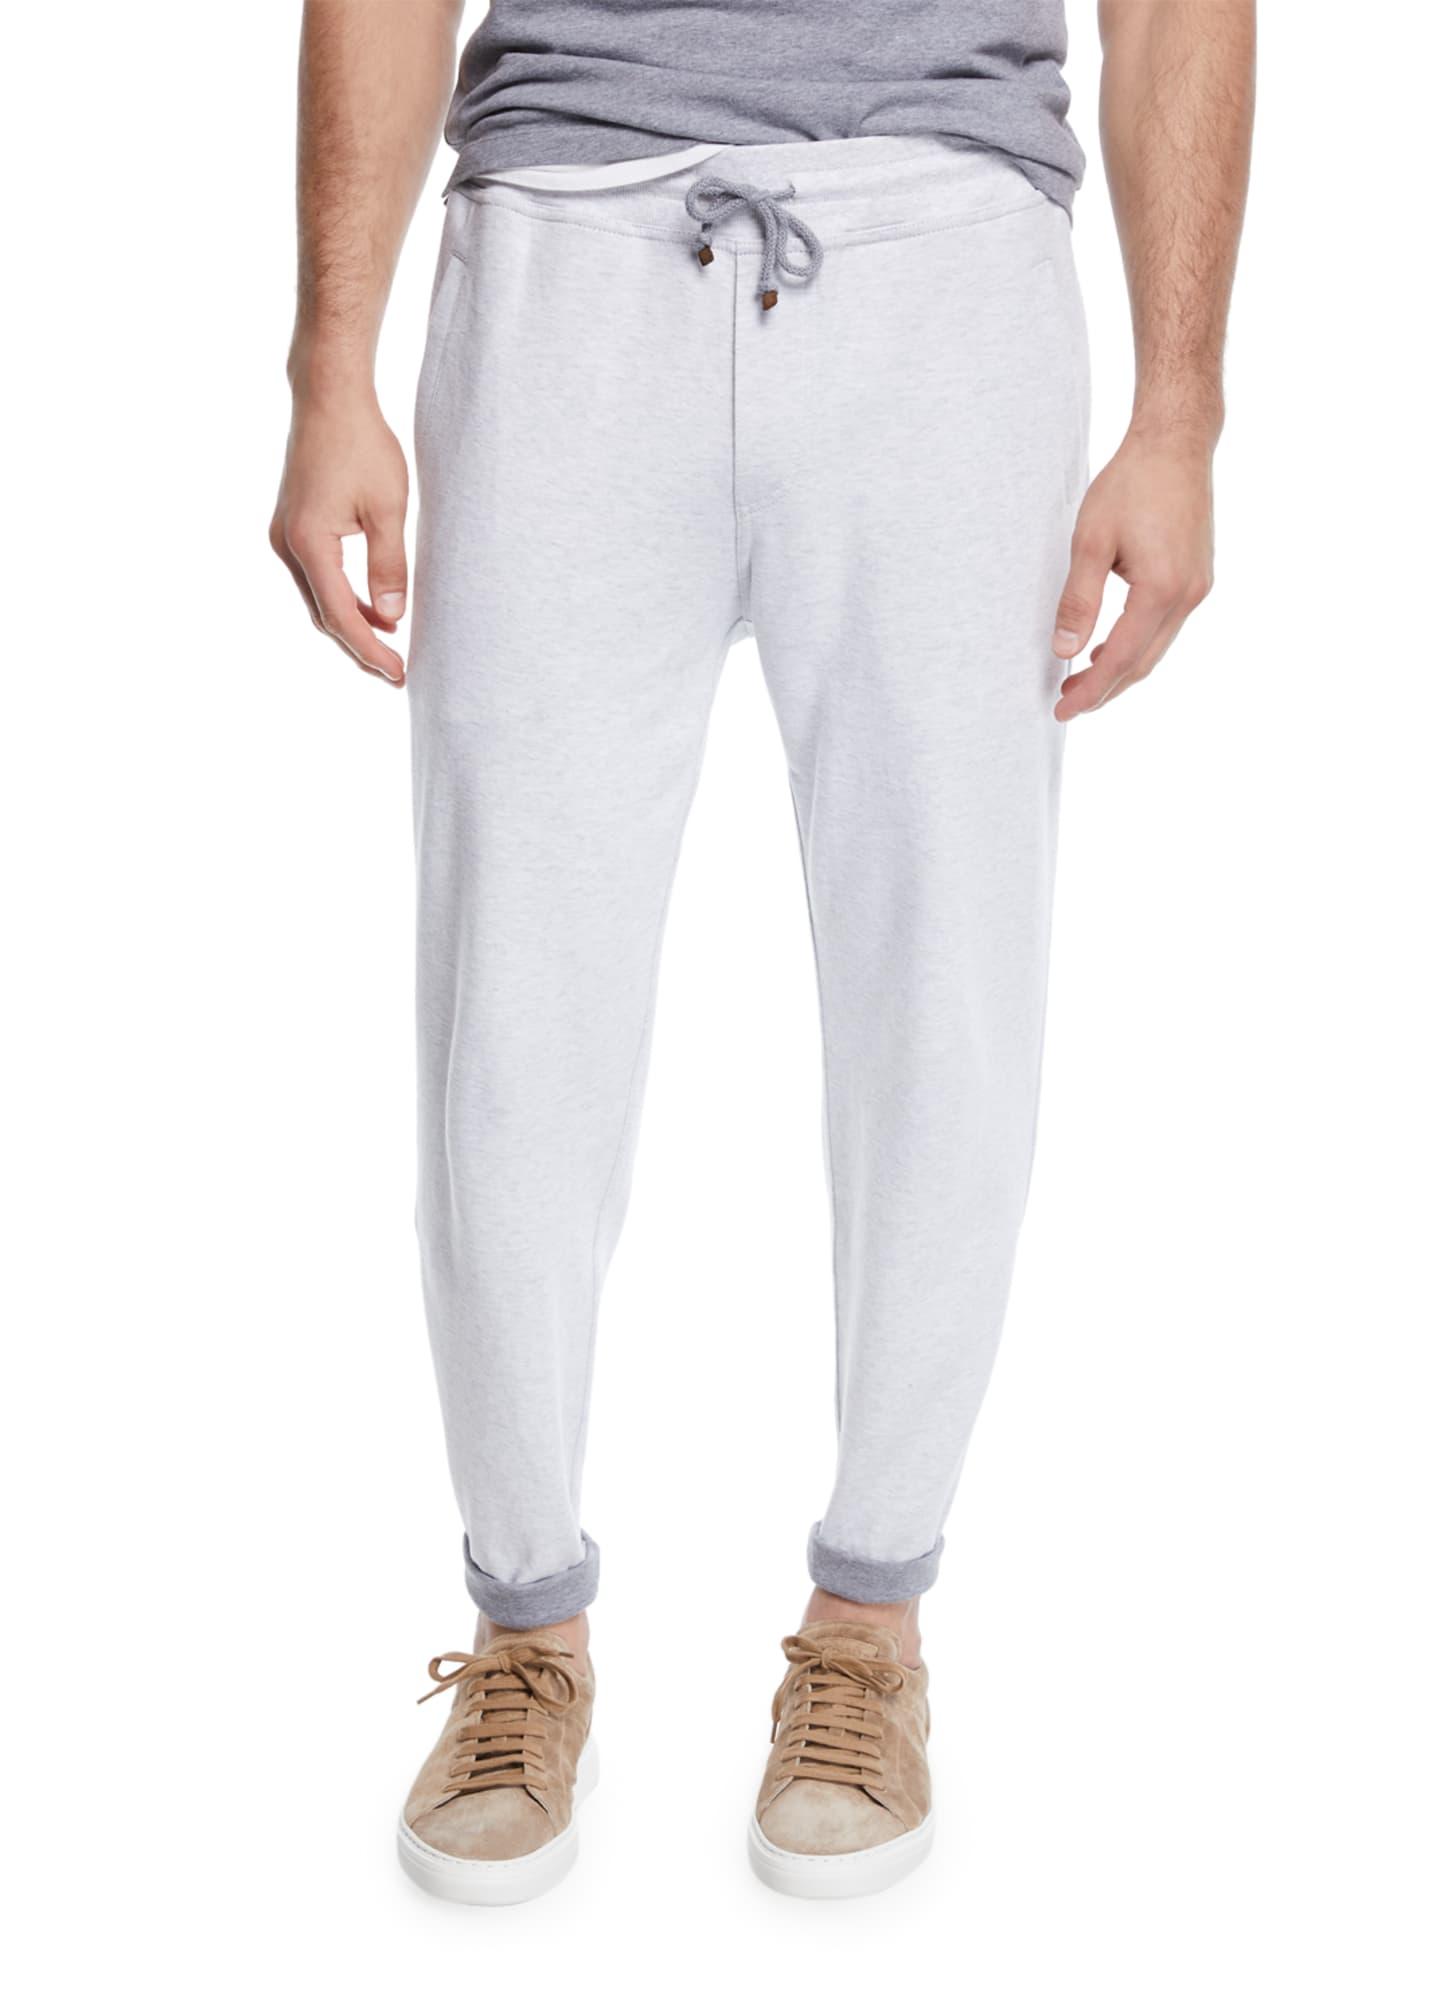 Brunello Cucinelli Men's Open Bottom Sweatpants